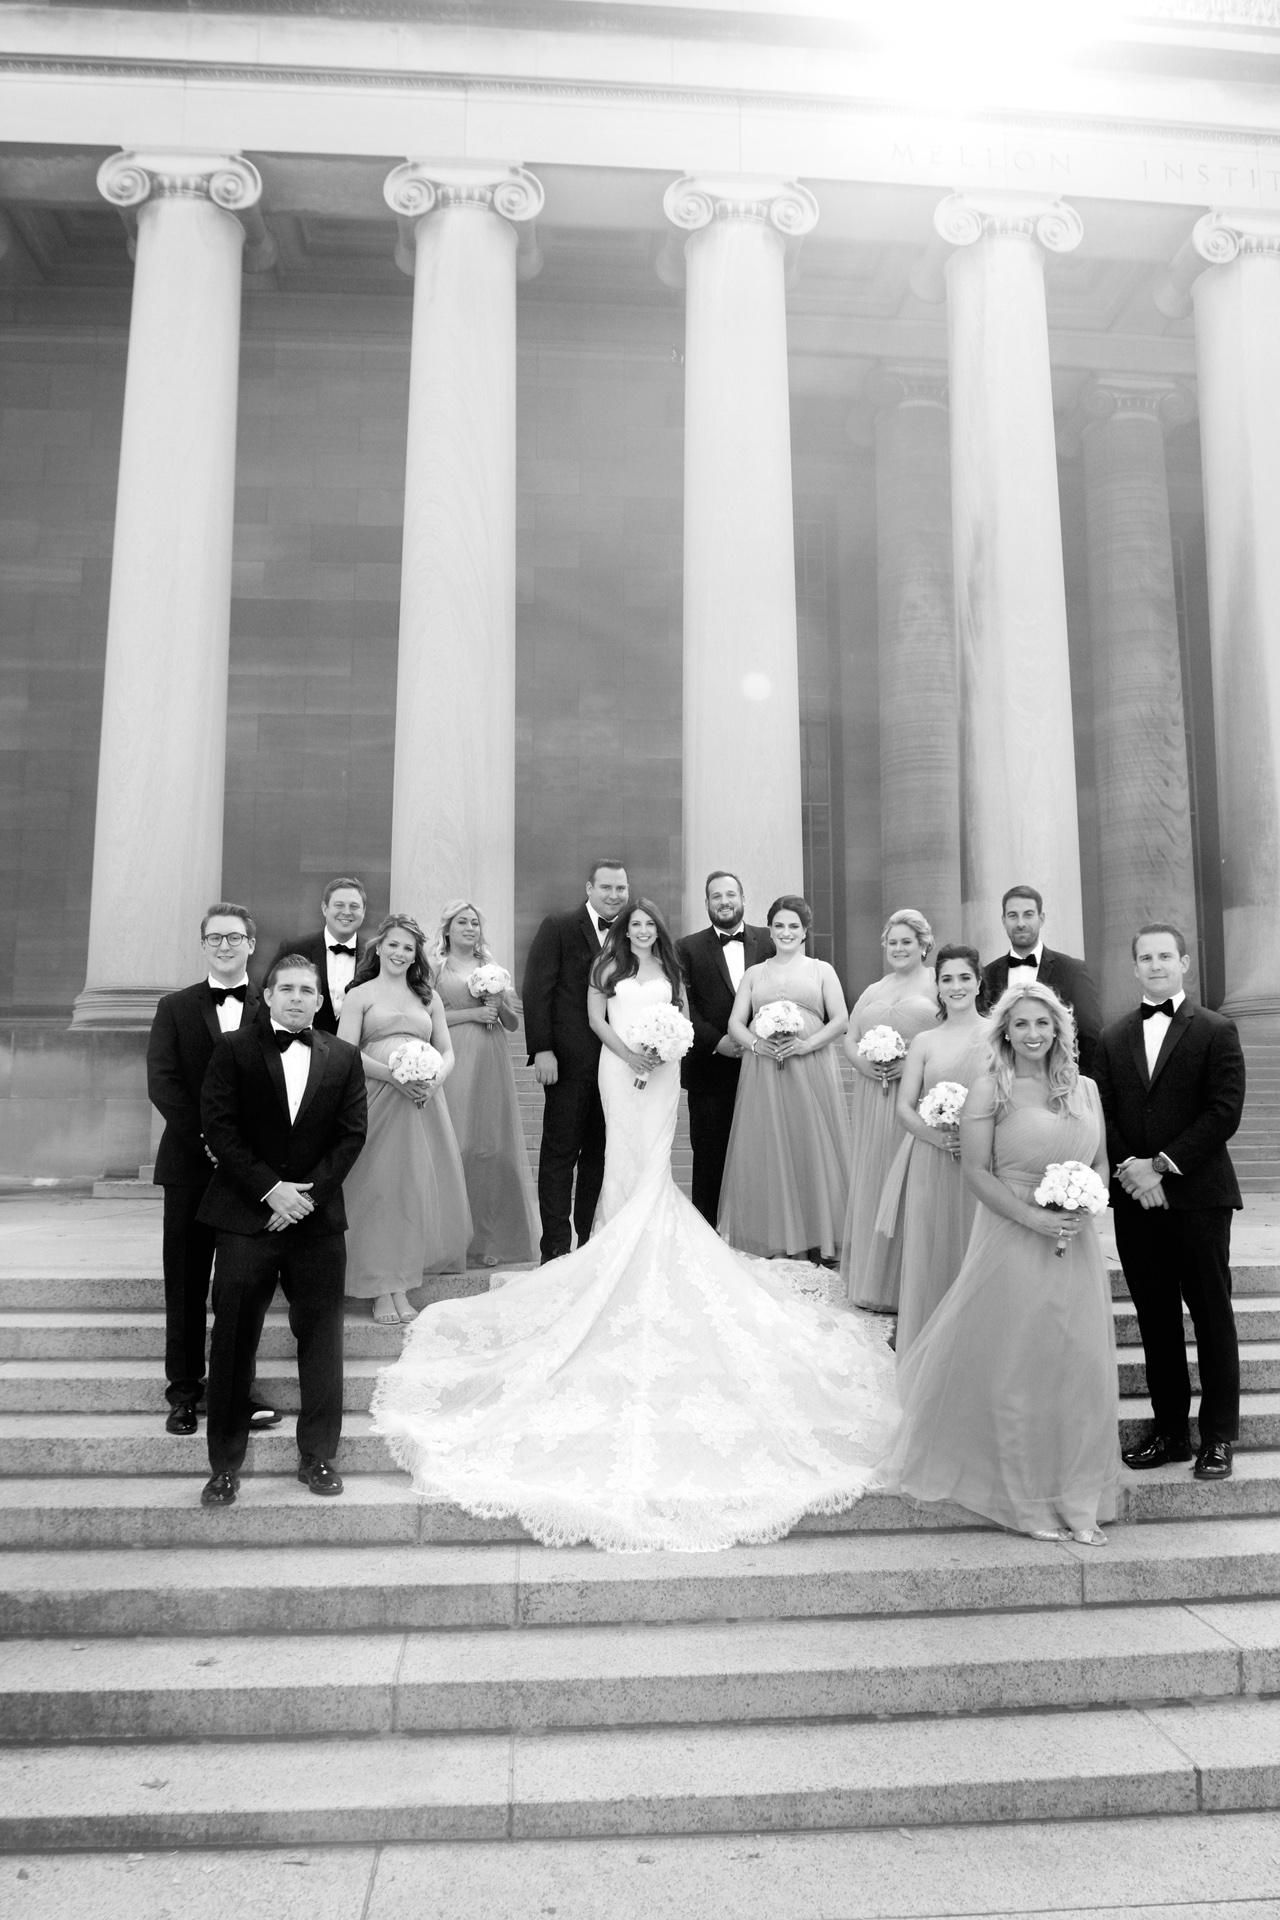 wedding-party-carnegie-mellon